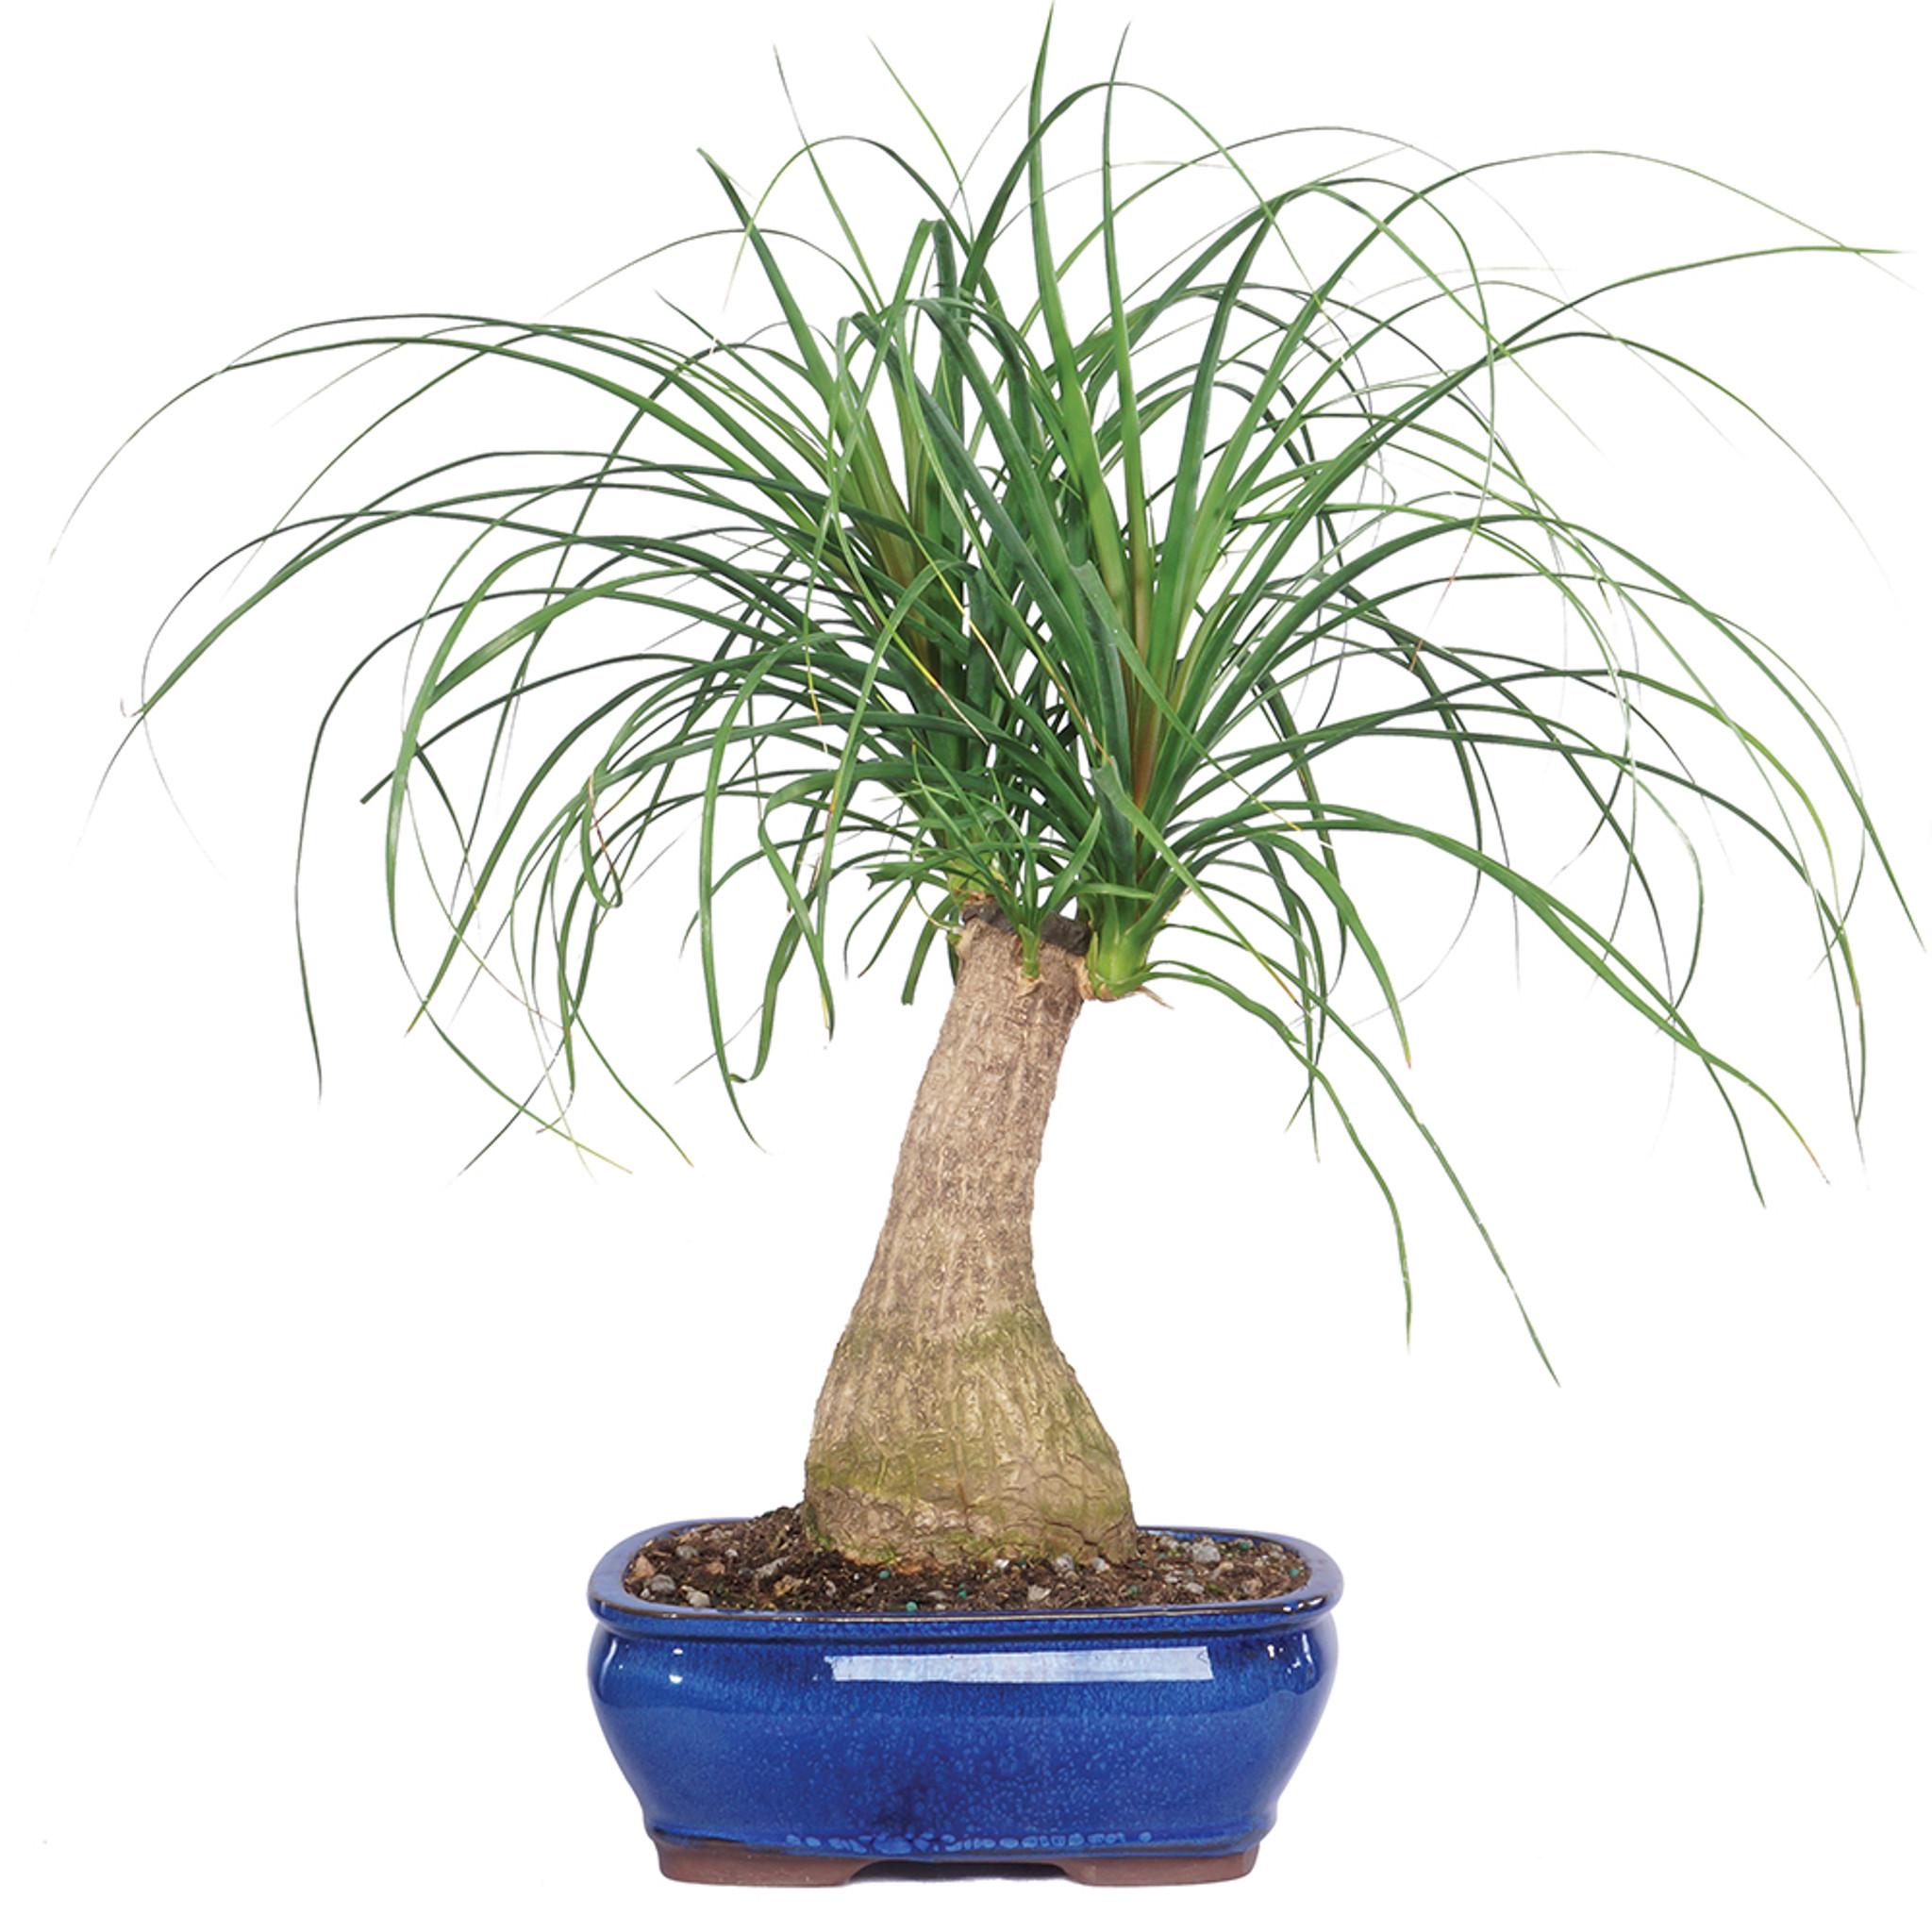 Ponytail Palm Beaucamea Indoor Bonsai 12 20 Brussel S Bonsai